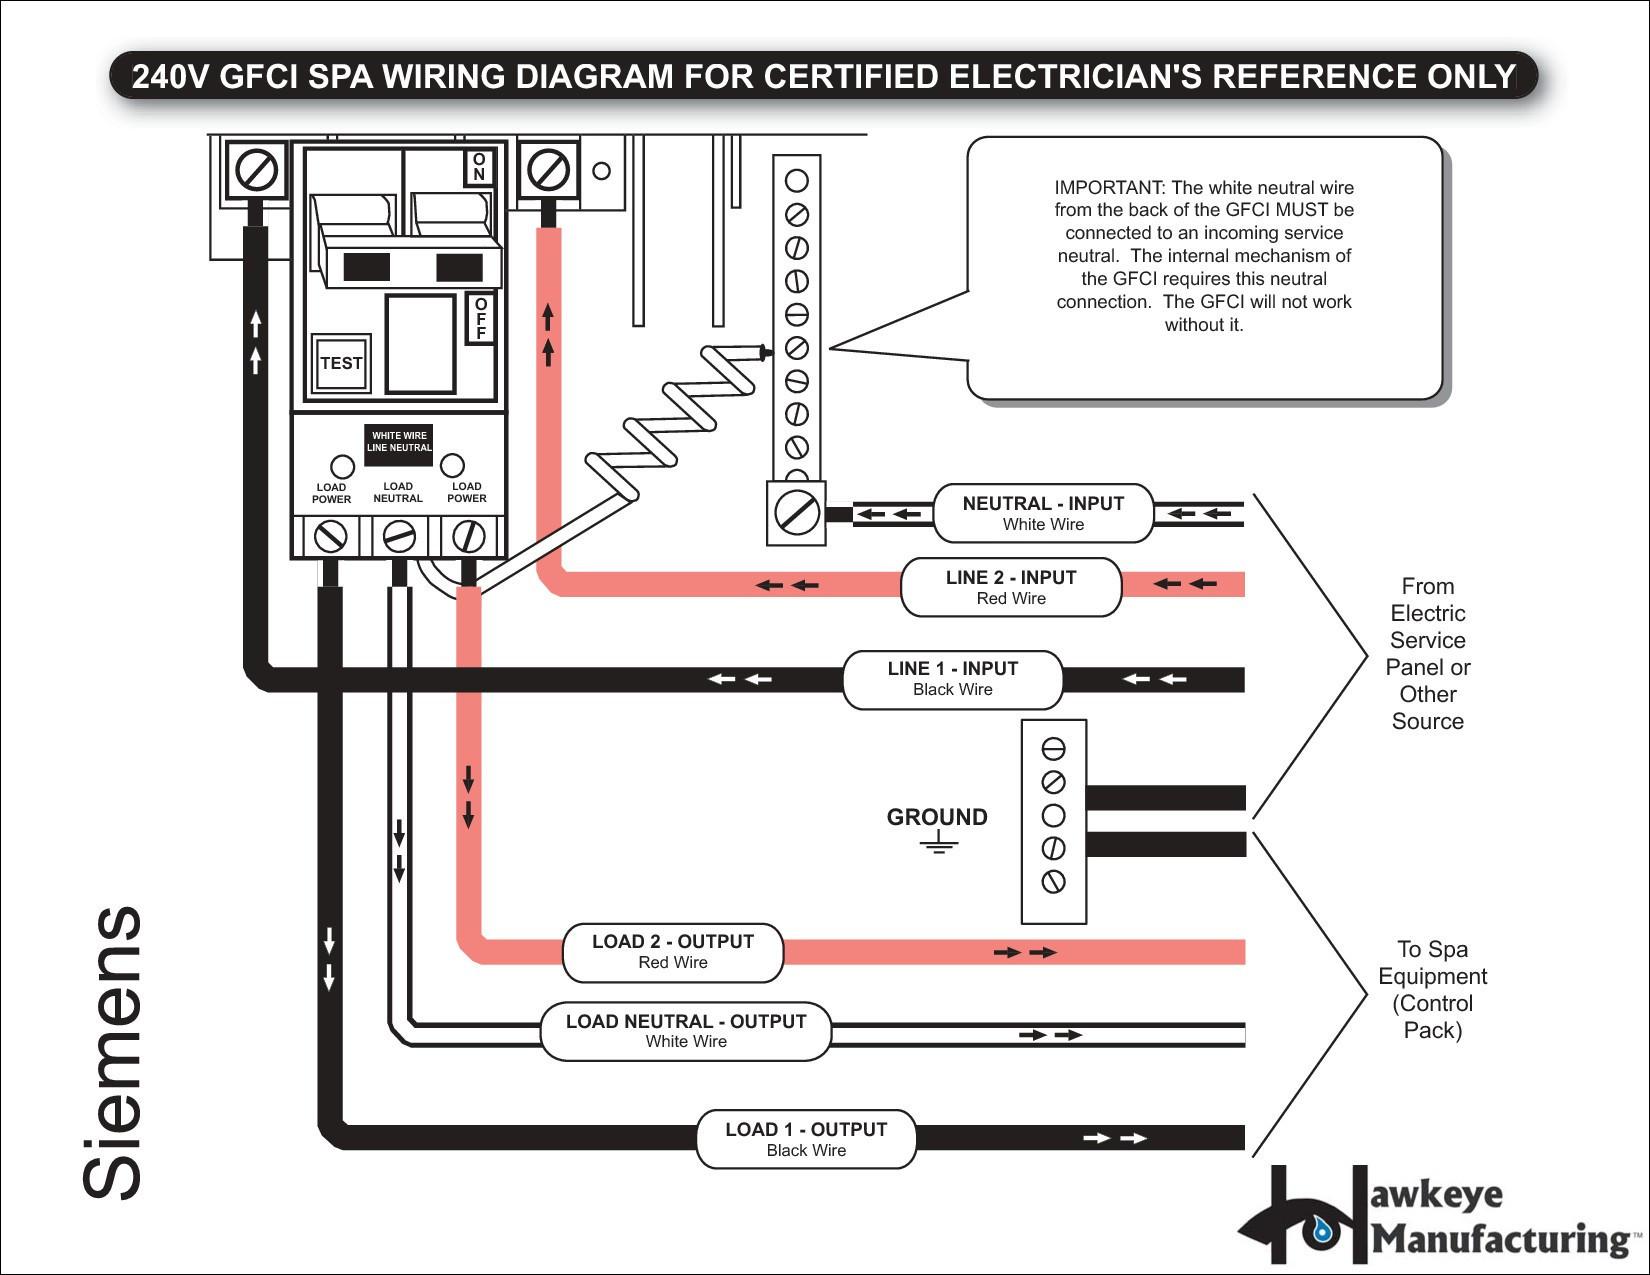 50 amp square d gfci breaker wiring diagram Collection-Wiring Diagram Gfci Breaker Save Wiring Diagram Gfci Outlet Valid 2 Pole Gfci Breaker Wiring Diagram 7-a